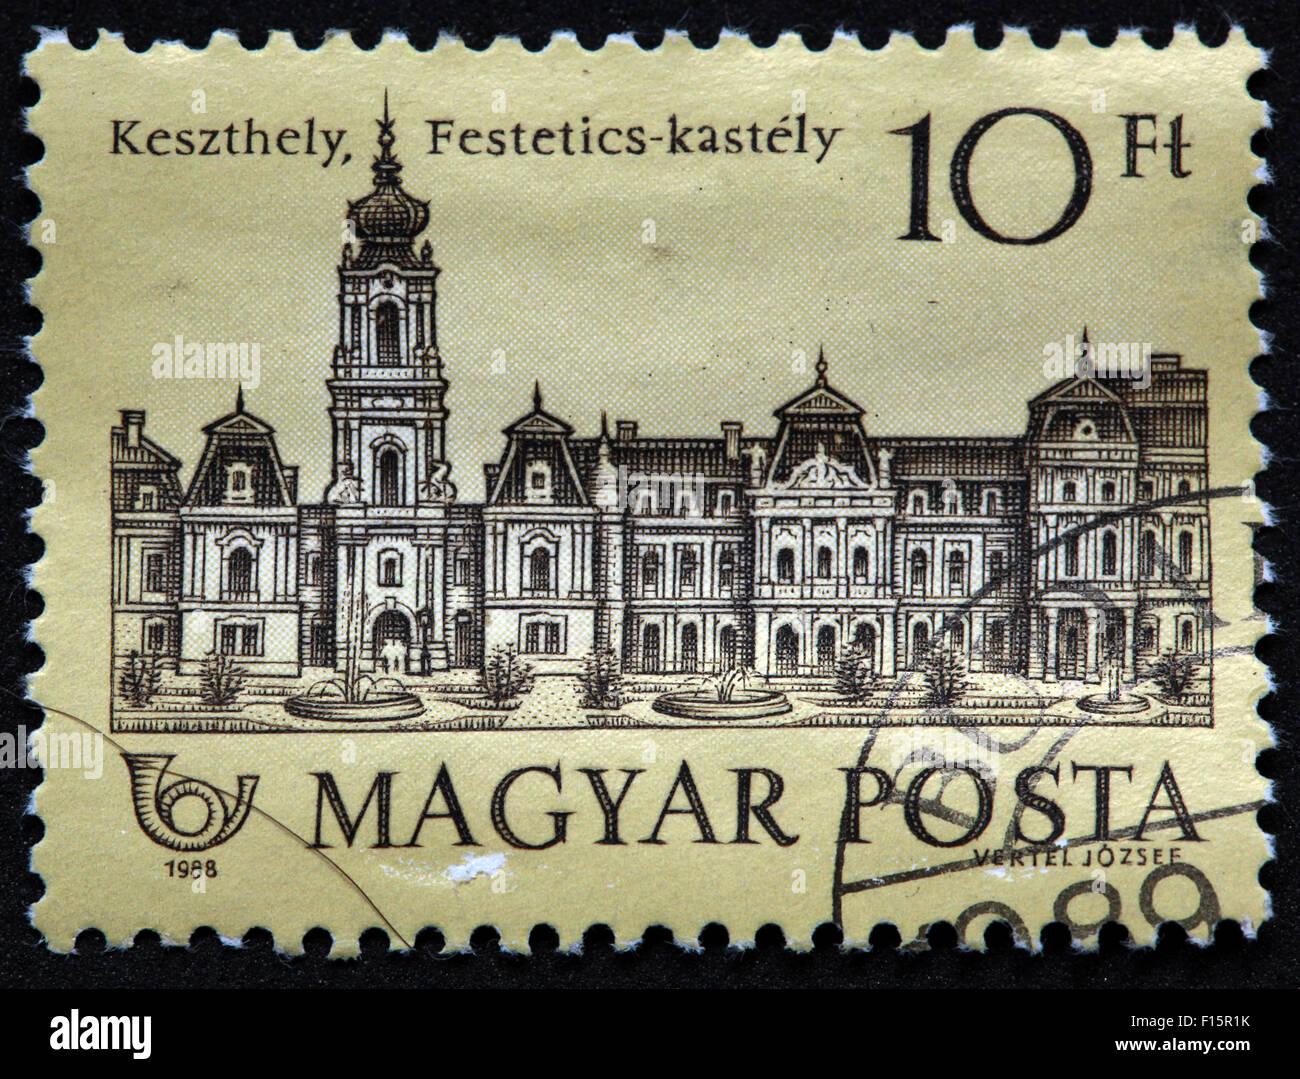 Magyar Posta vertel Jozsee 10Ft Keszthely Festetics-kastely 1988 Stamp - Stock Image